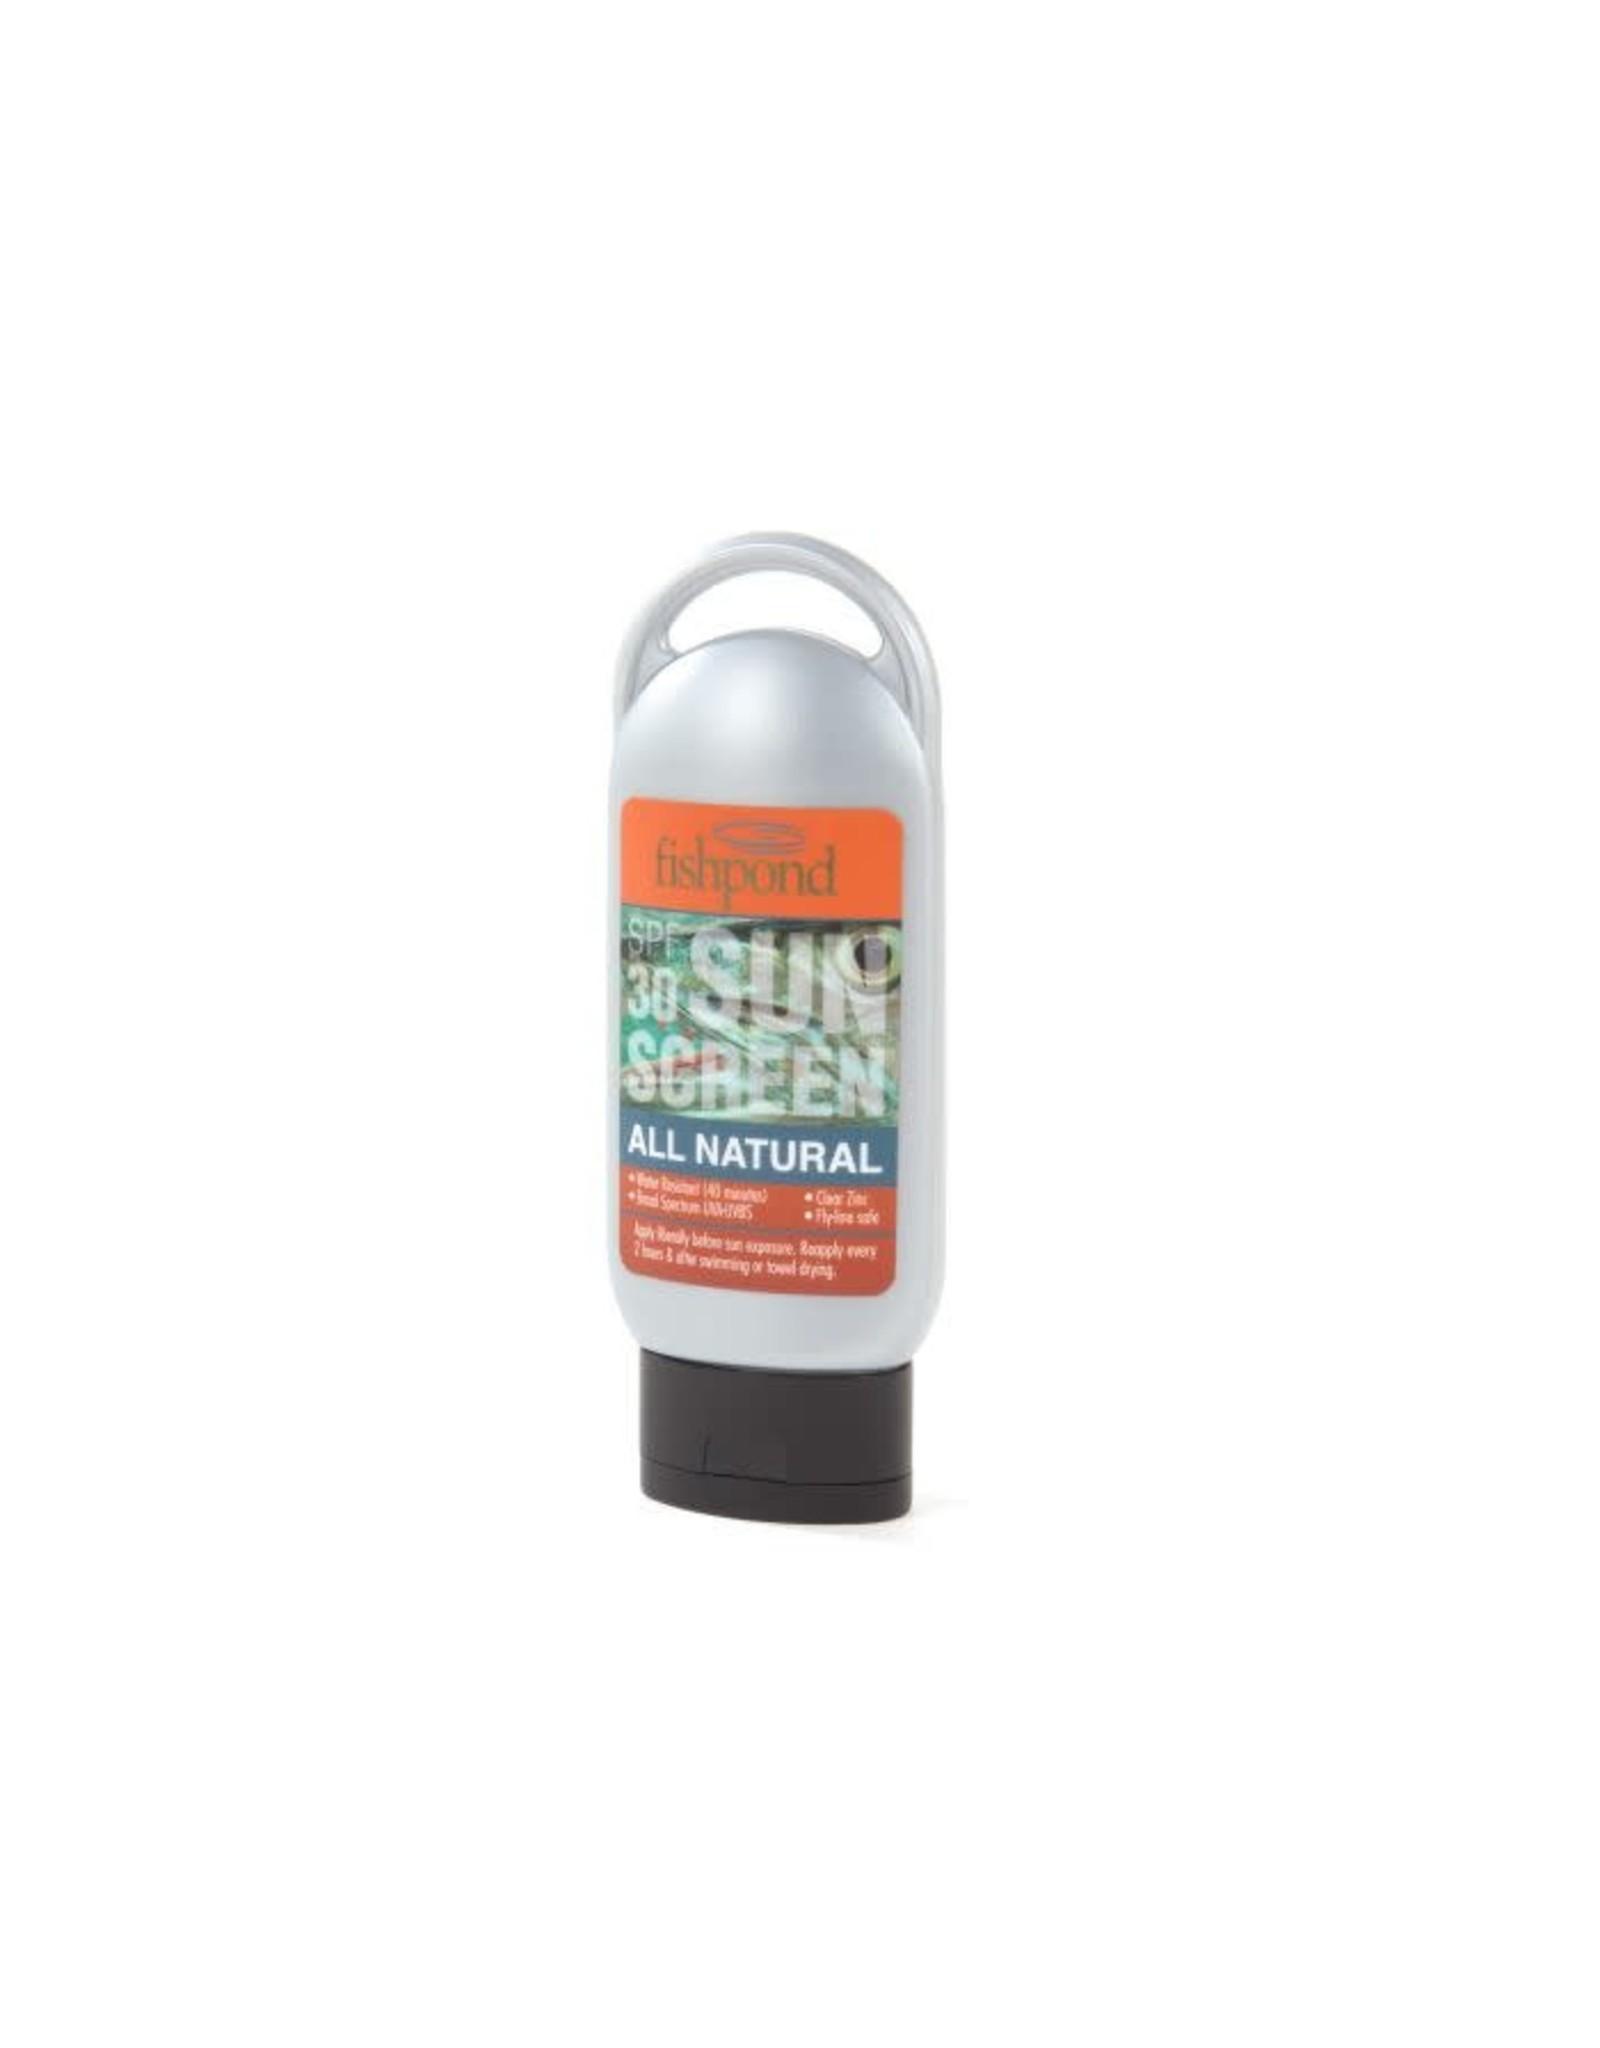 FISHPOND Fishpond Sunscreen - SPF 30